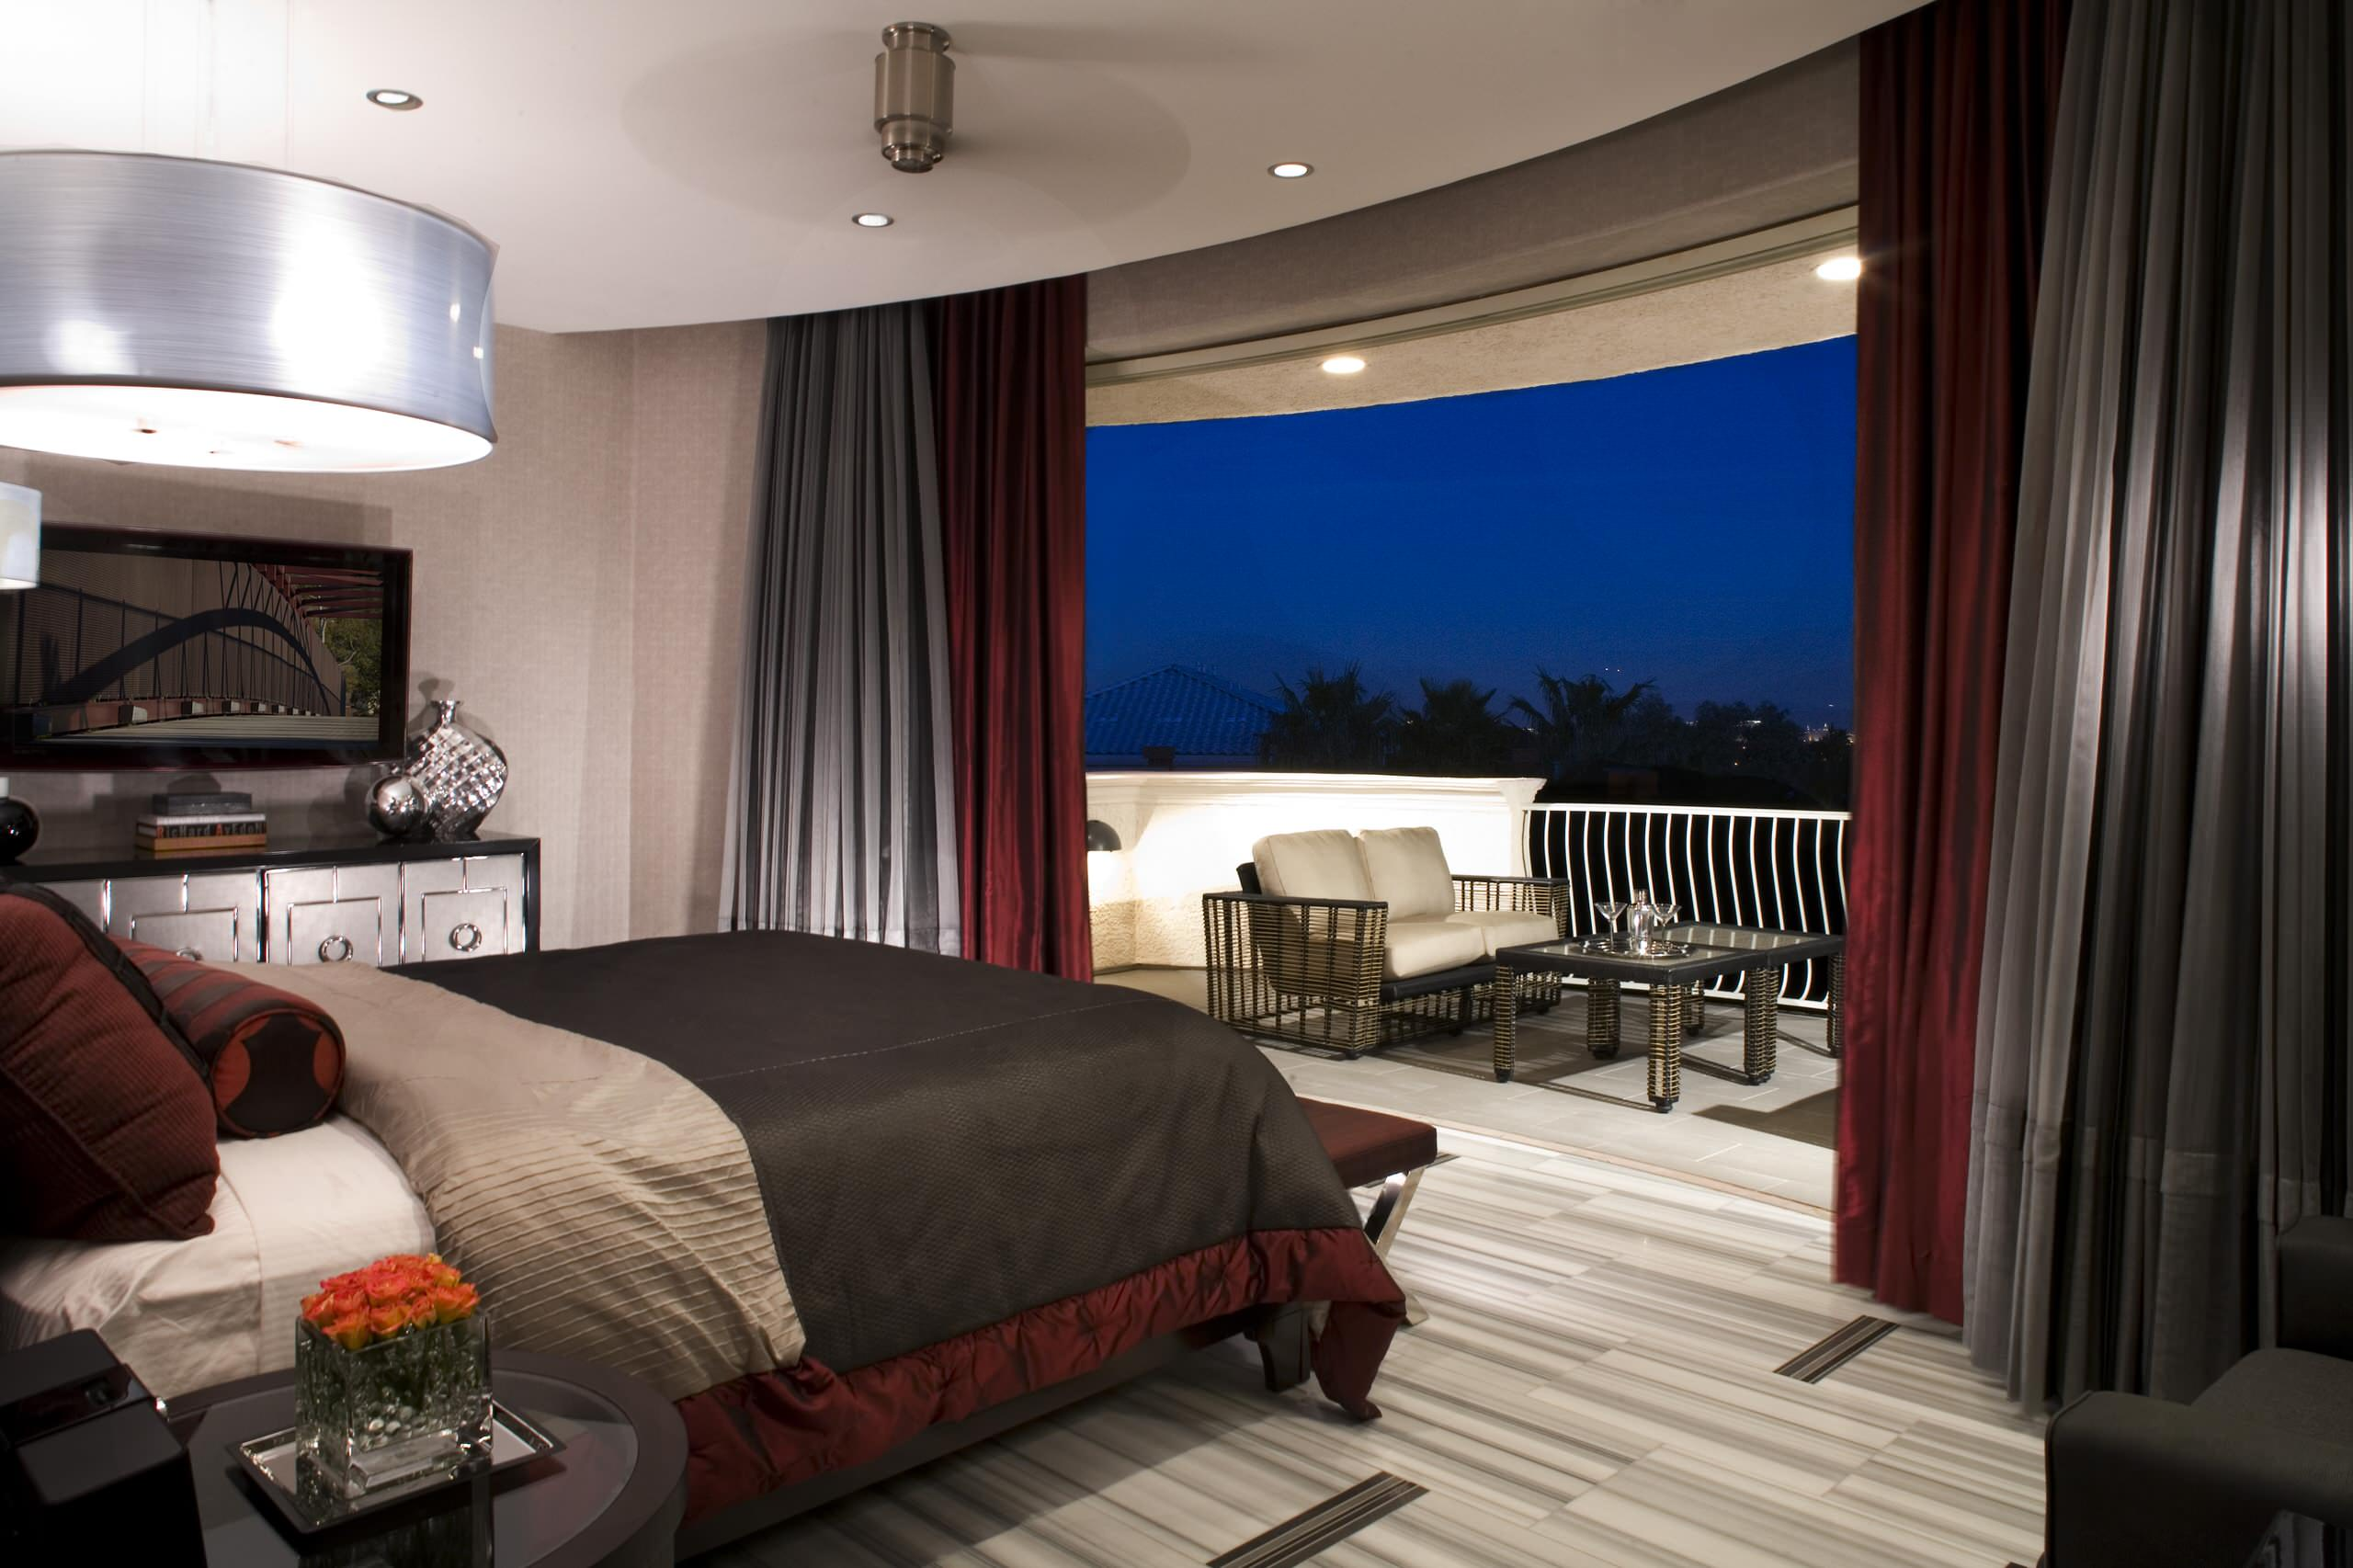 Floor Tiles Bedroom Ideas And Photos Houzz